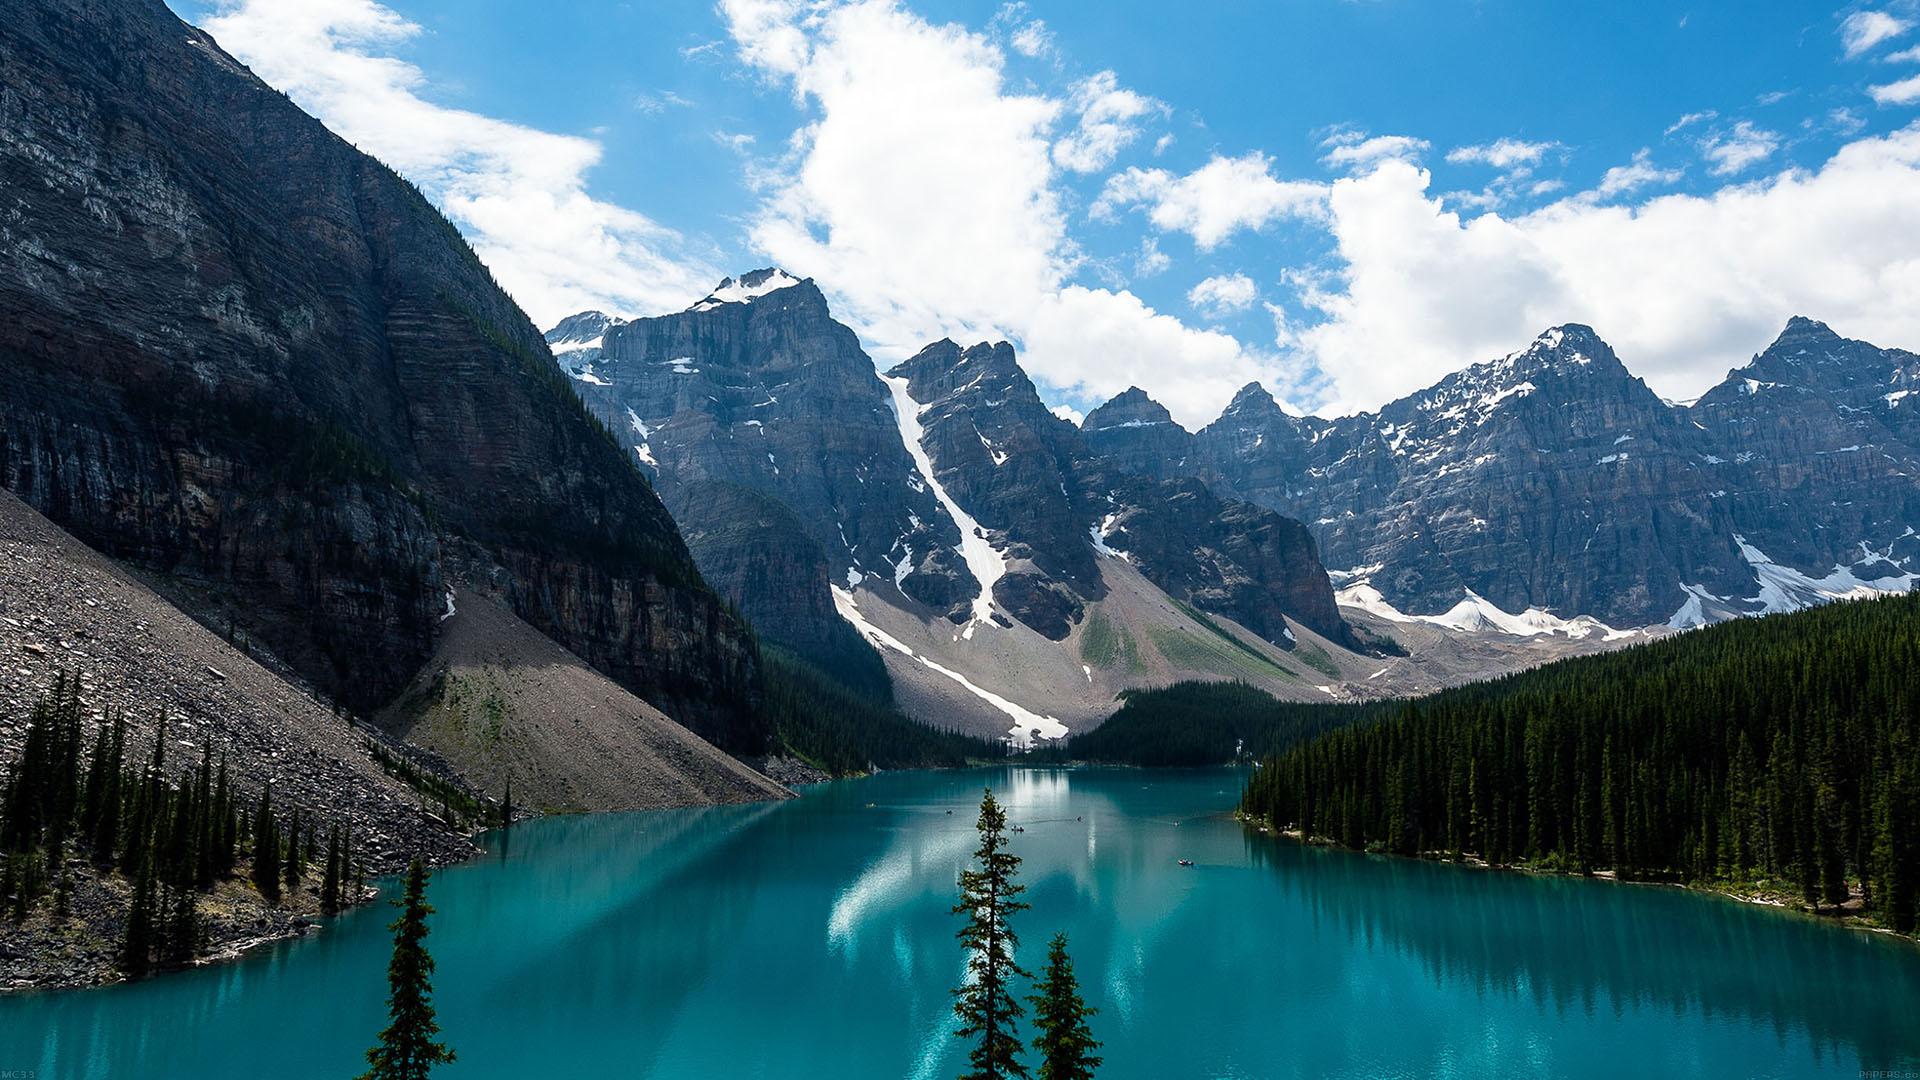 I Love Papers Mc33 Wallpaper Emerald Lake Canada Mountain